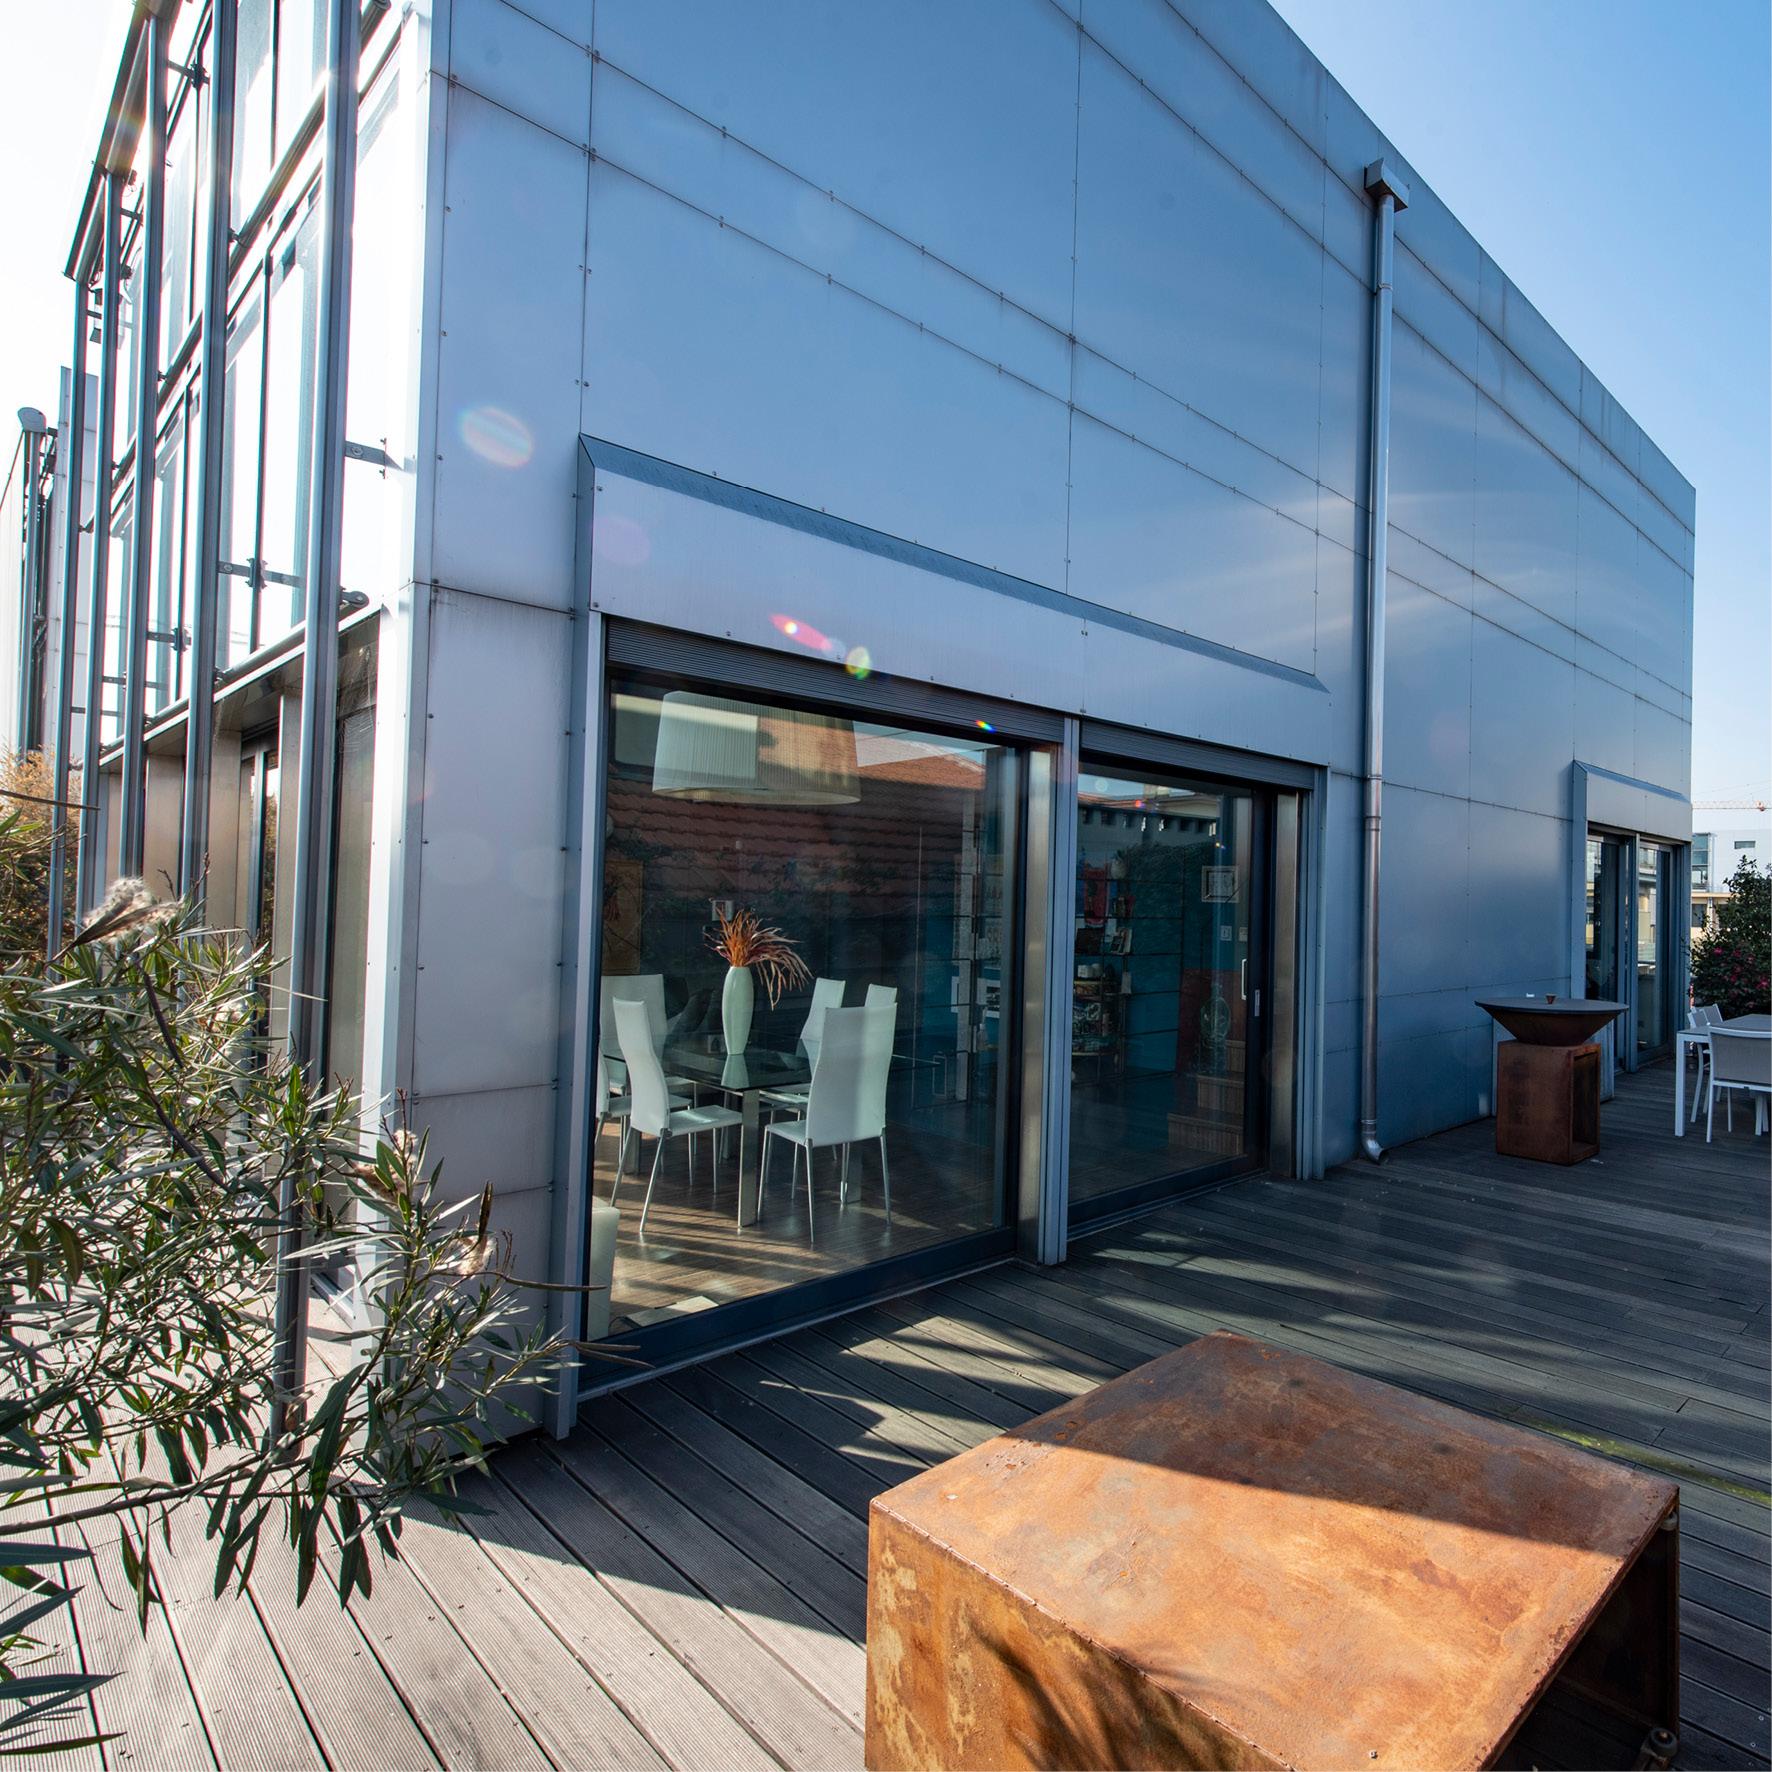 Torino loft ex ceat open house torino for Casa design torino